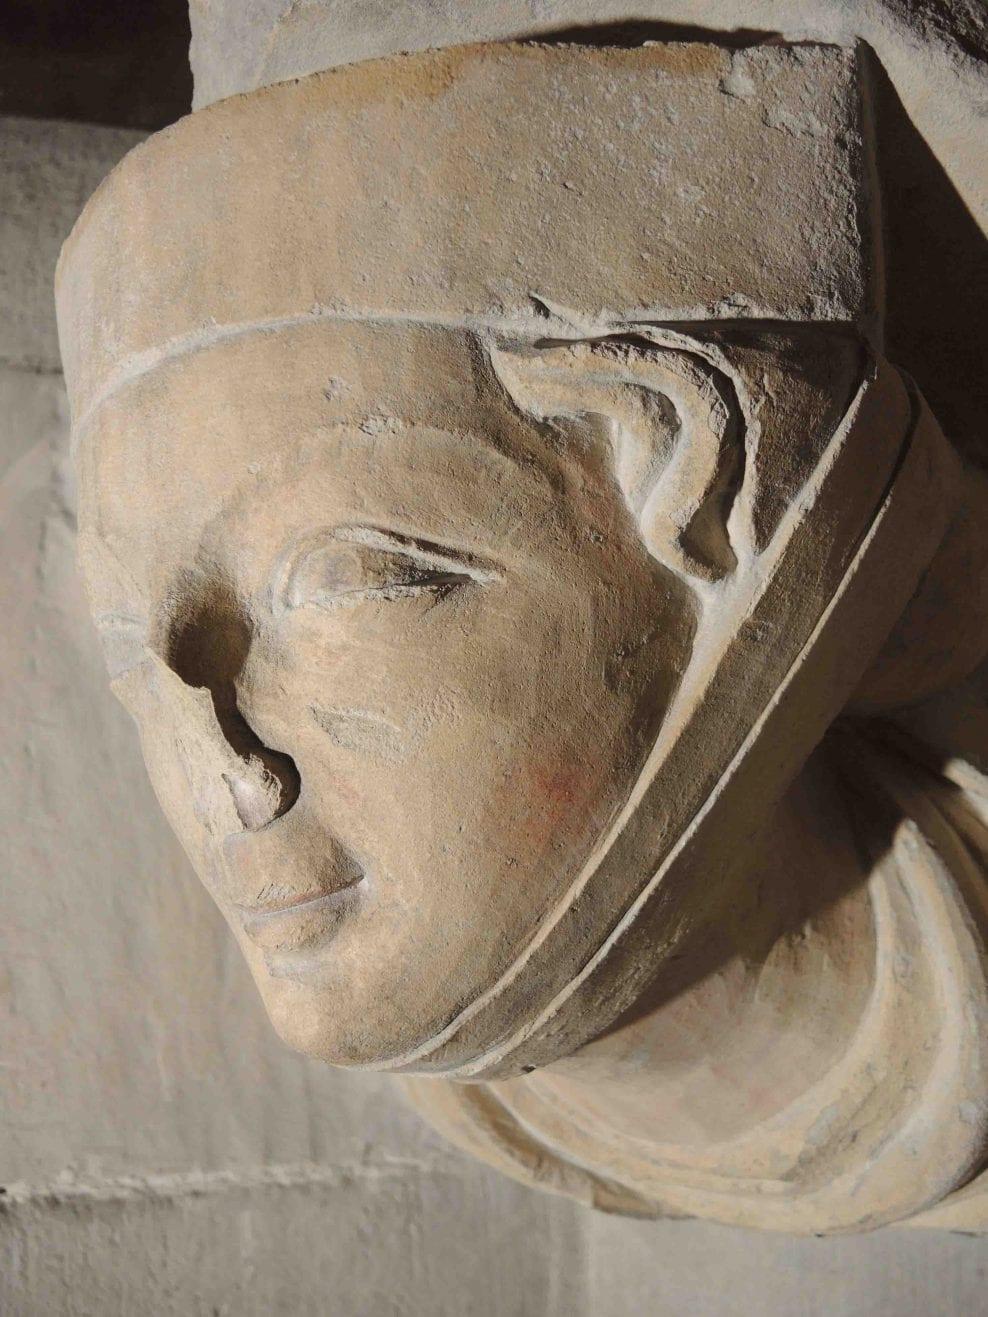 Westminster Abbey, Triforium sculpture